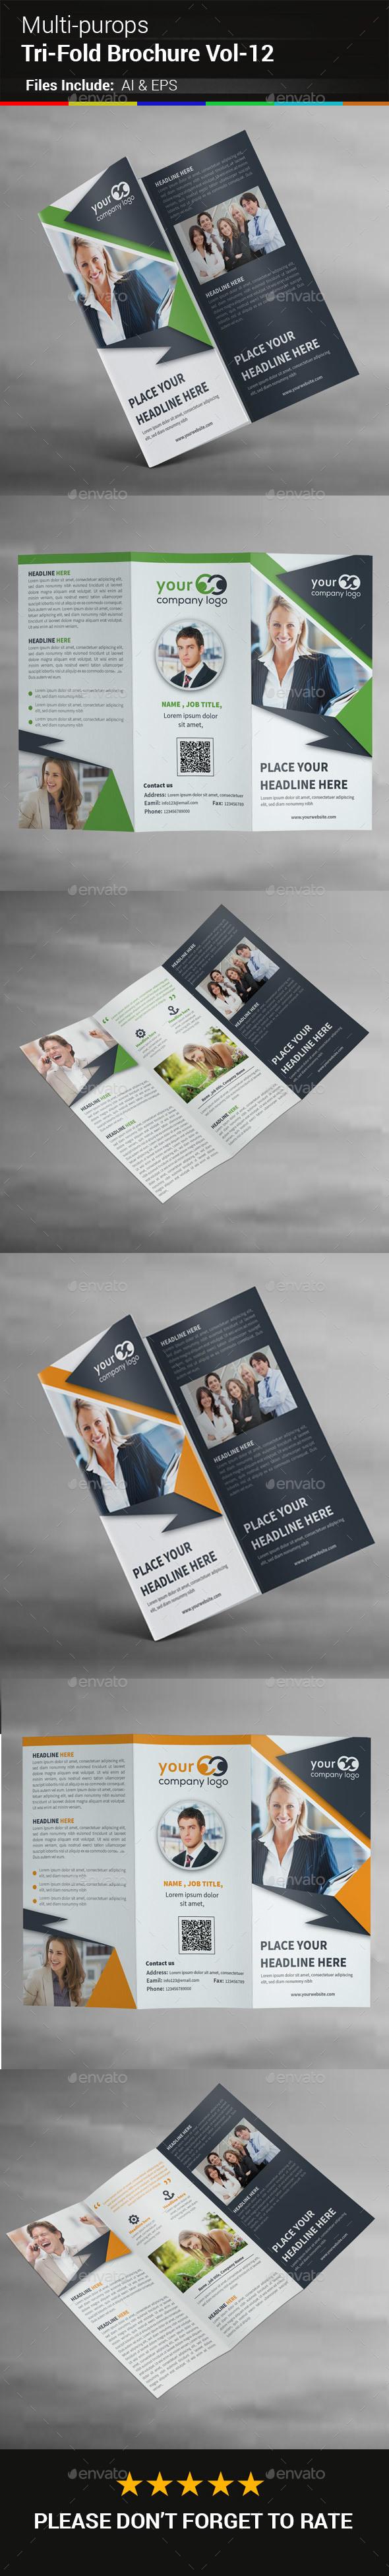 Multipurpose Business Tri-Fold Brochure Vol-12 - Corporate Brochures